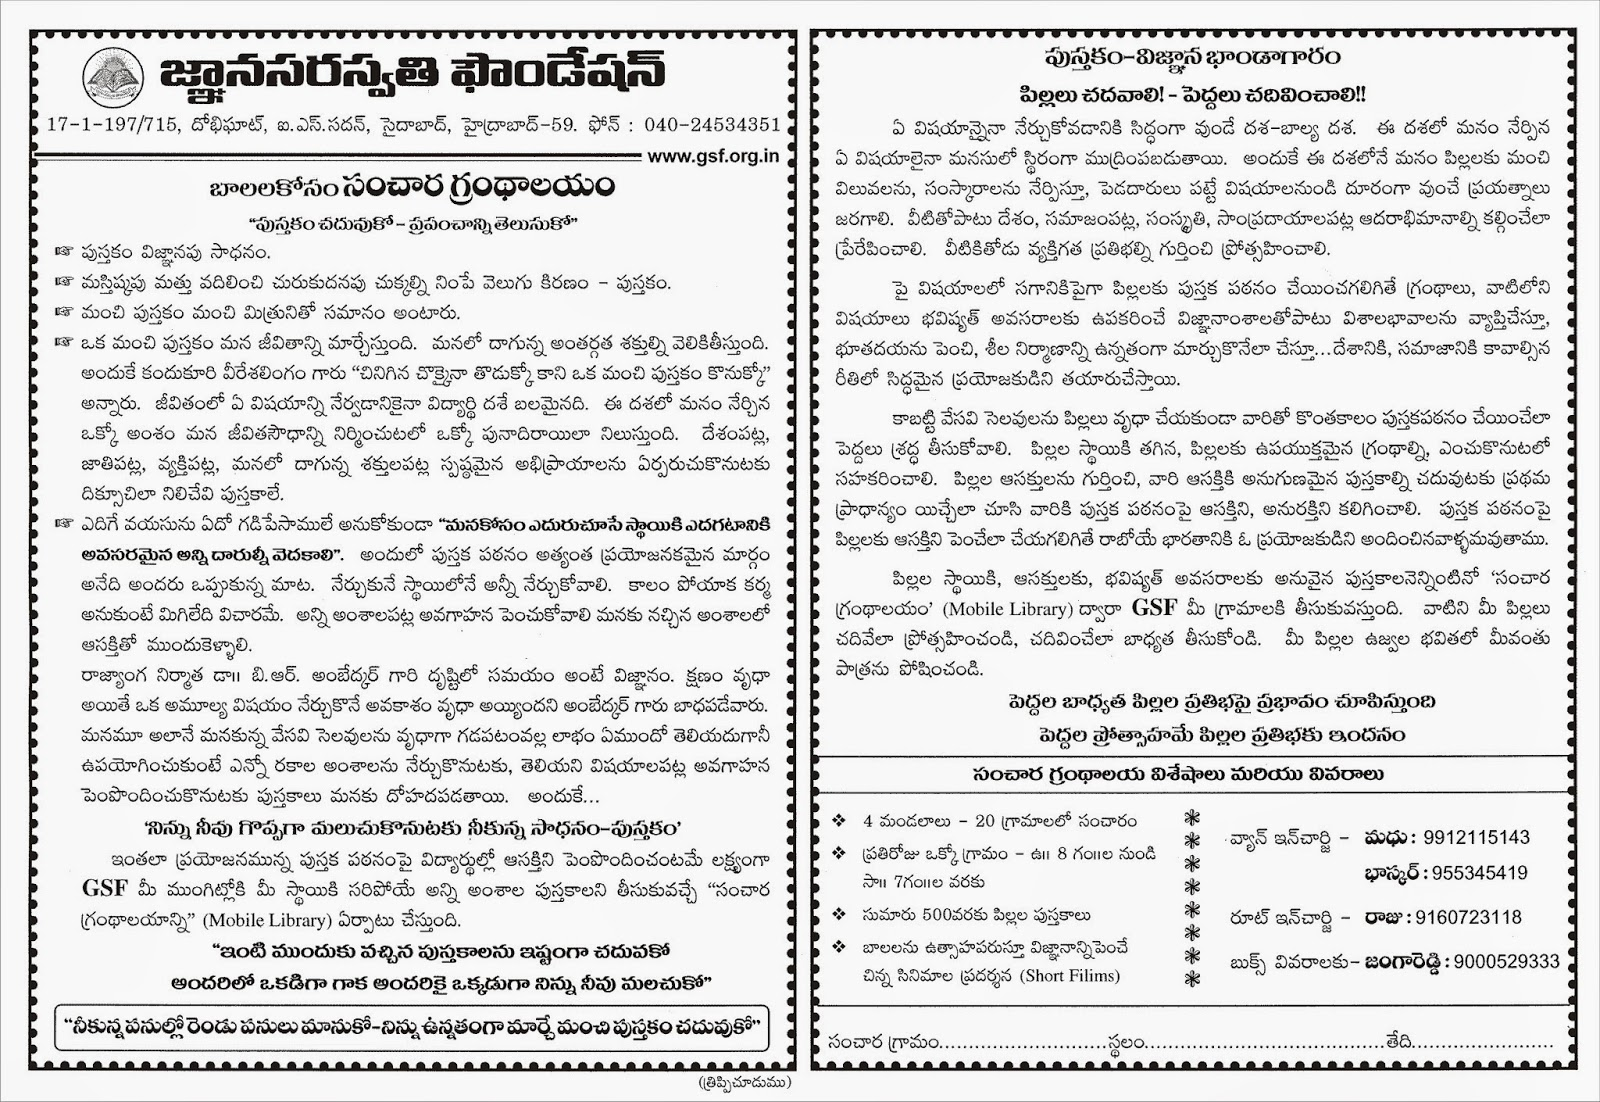 kannada essay on library (English>Kannada) - MyMemory